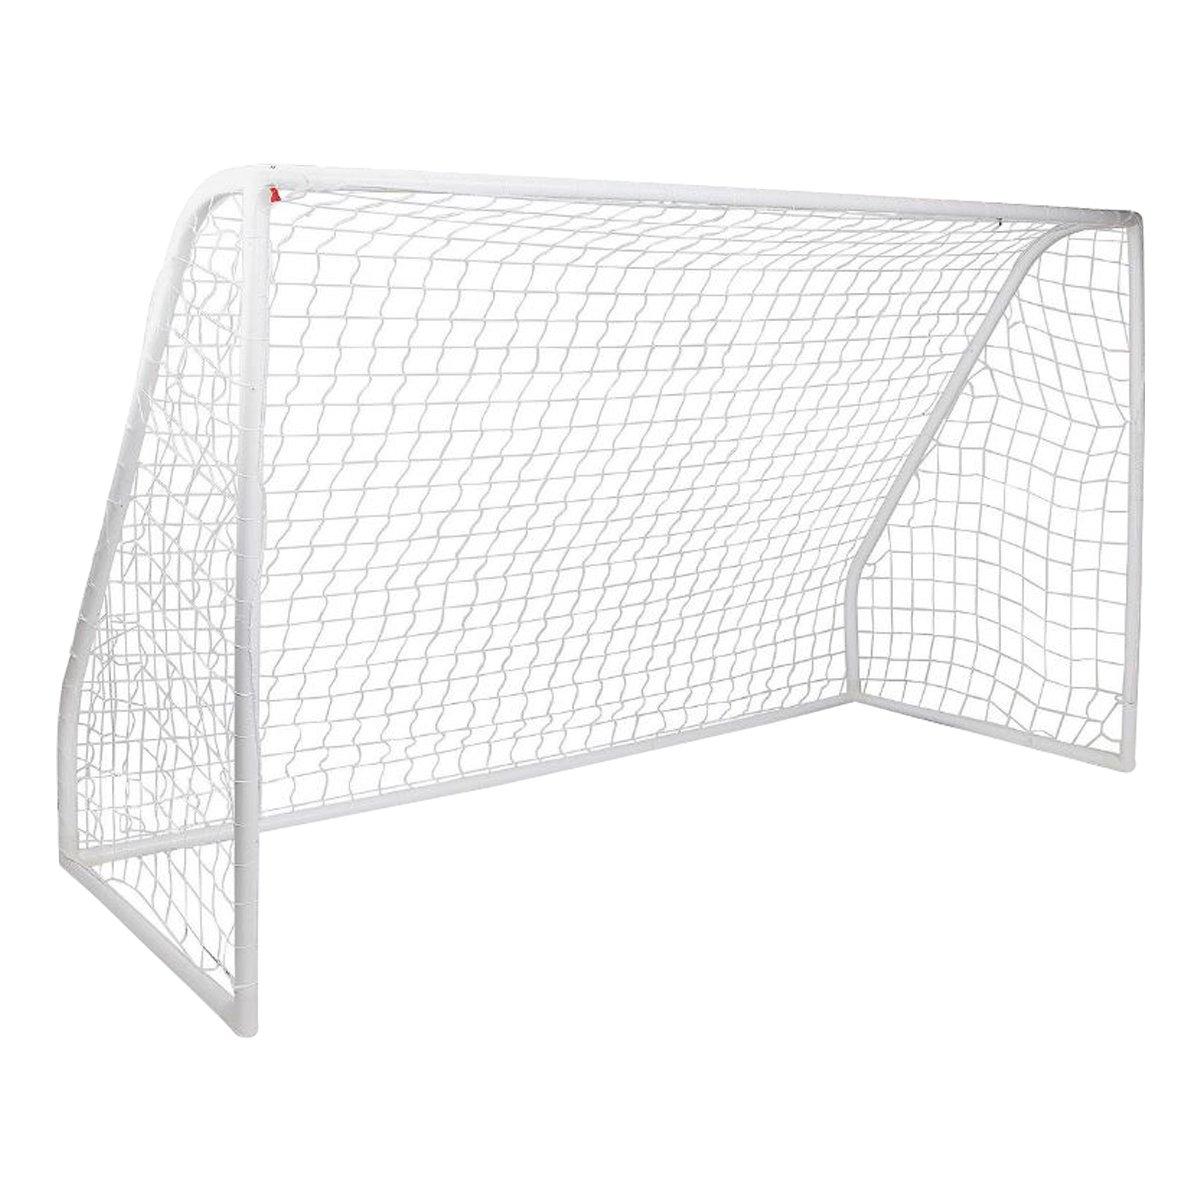 Bentley Sports - Tragbares Fußballtor mit Netz, Haken & Heringen - 3 ...